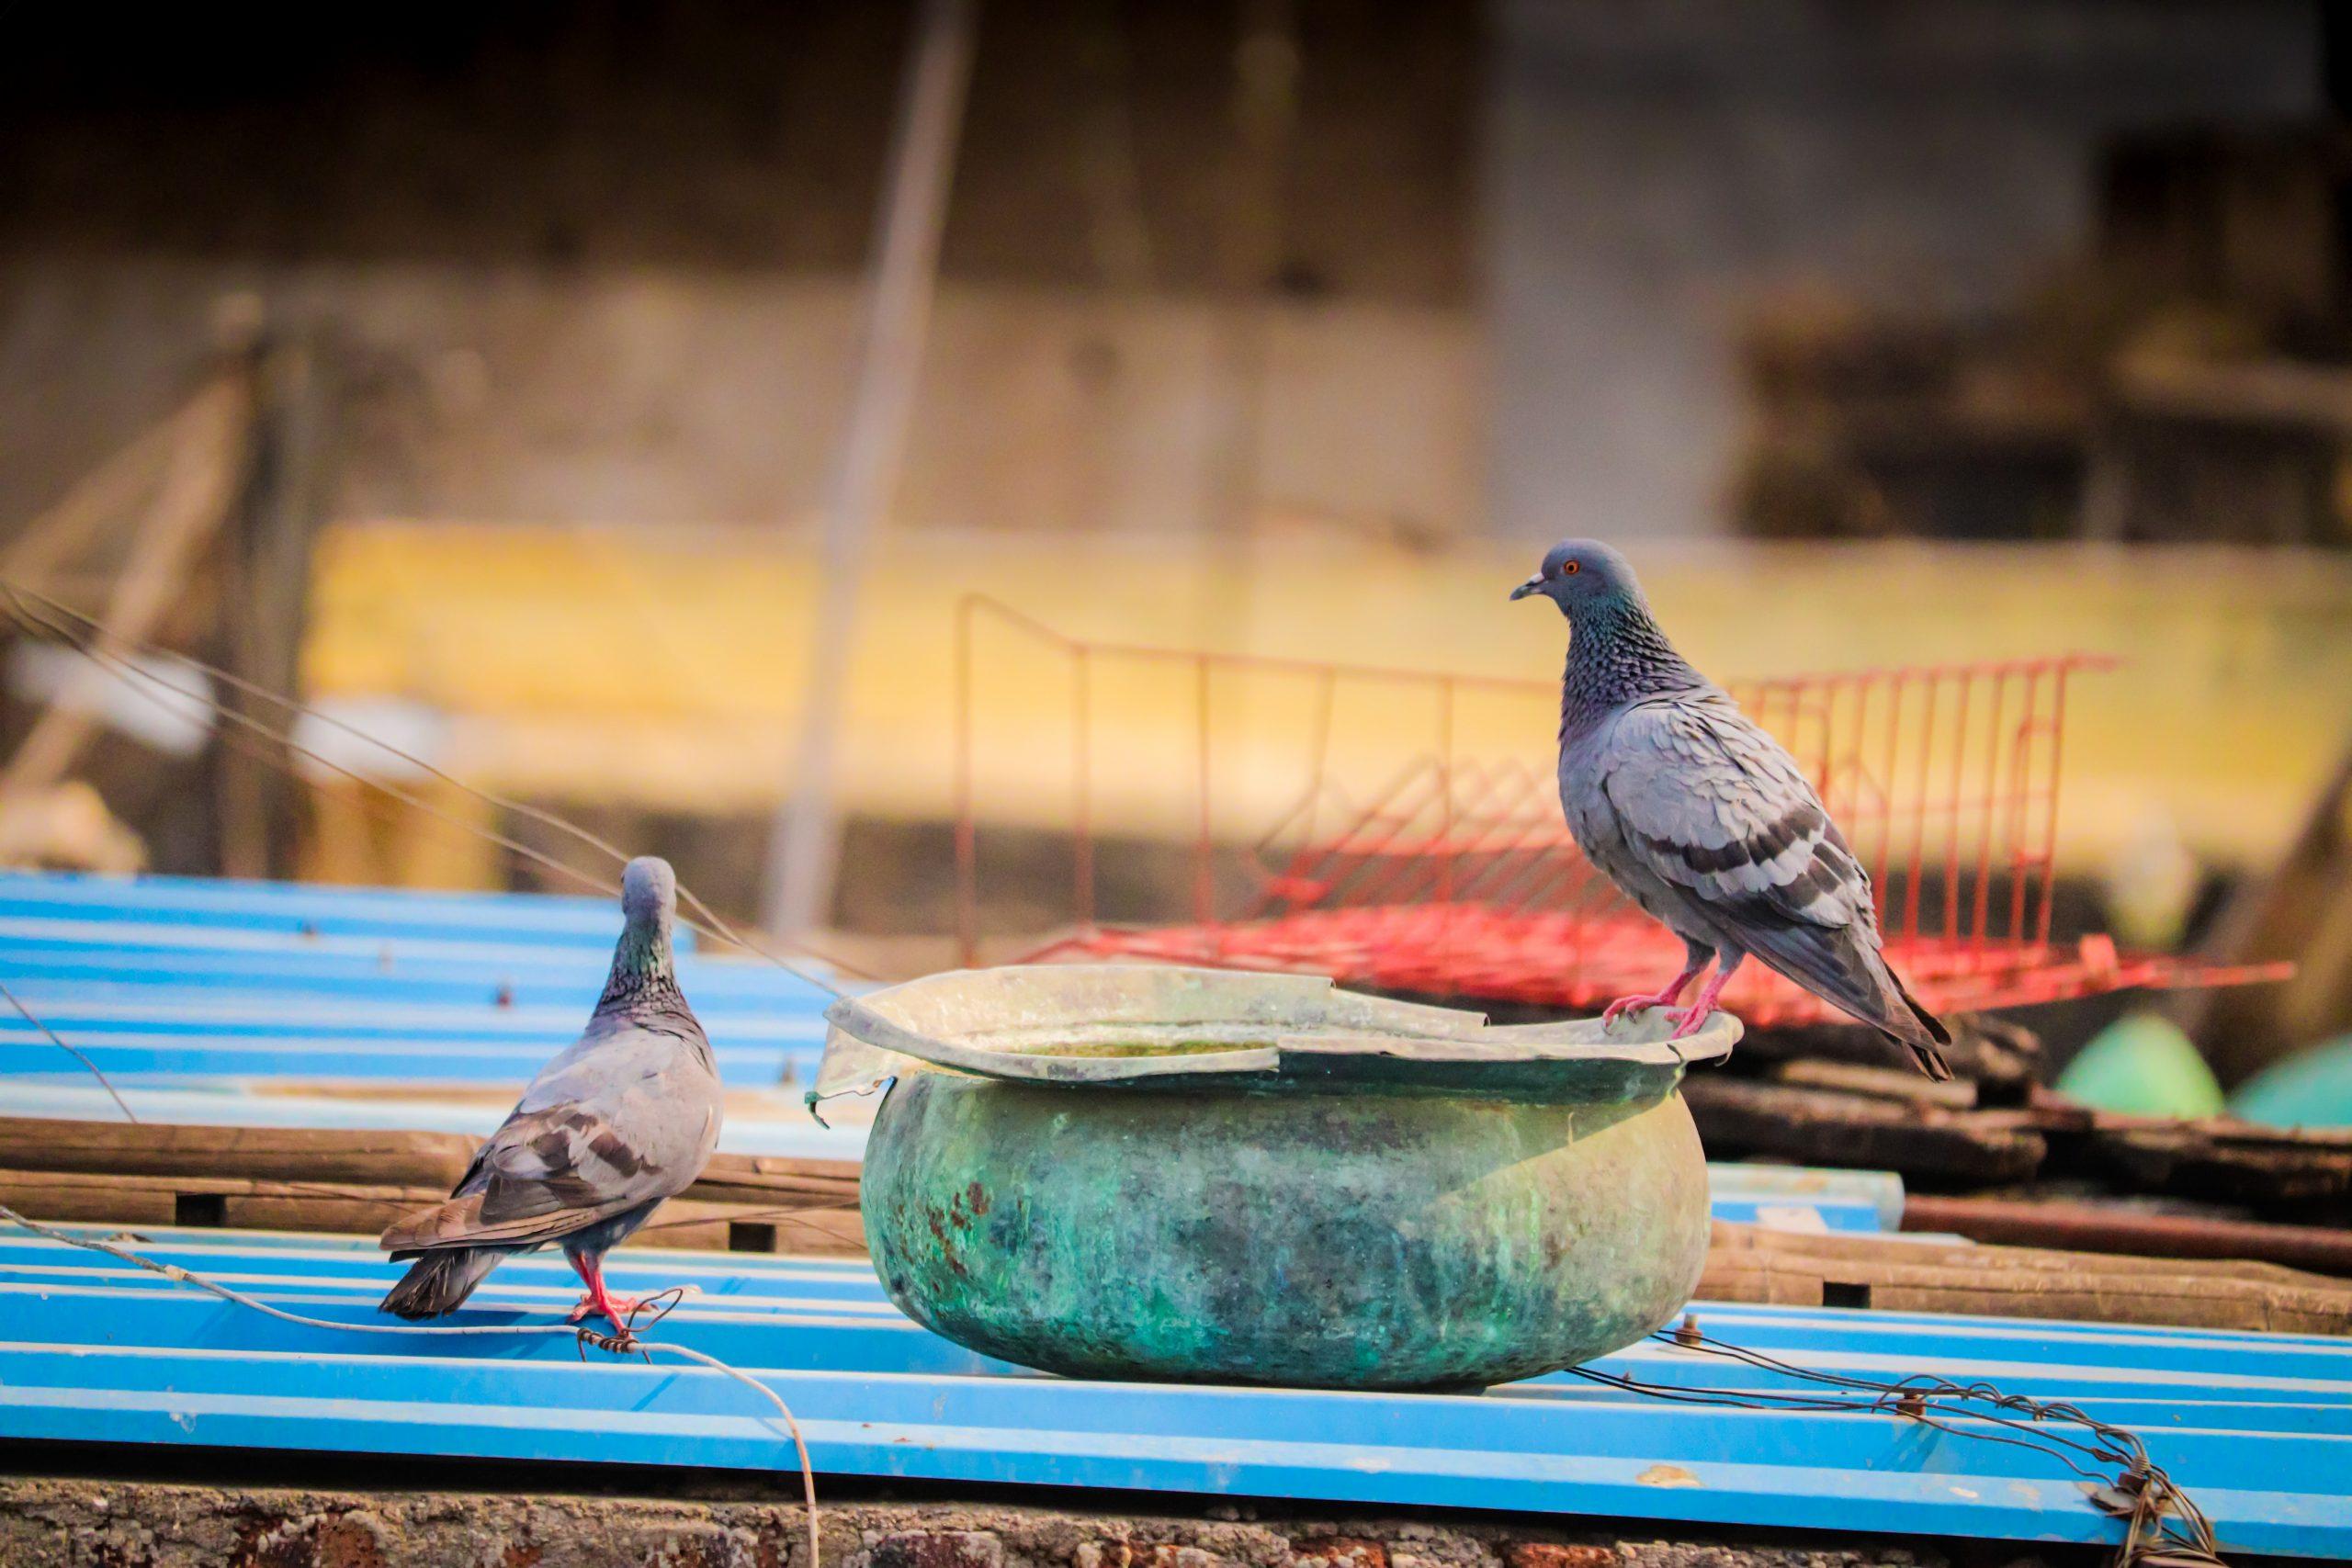 Thirsty pigeons